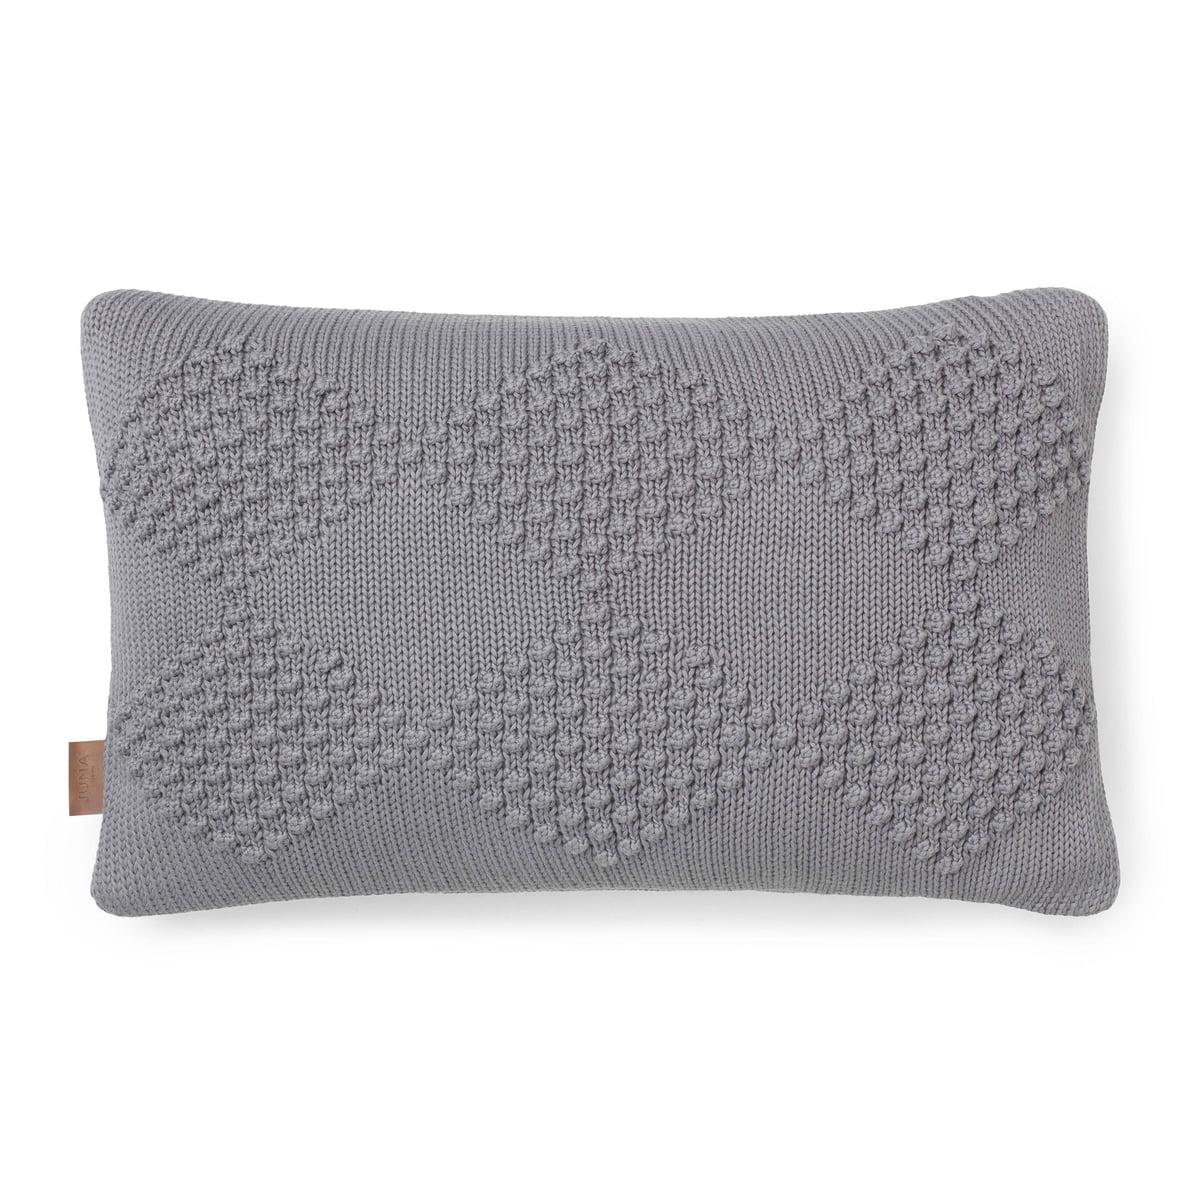 juna diamond kissen 60 x 40 cm grau grau t 40 b 60 online kaufen bei woonio. Black Bedroom Furniture Sets. Home Design Ideas